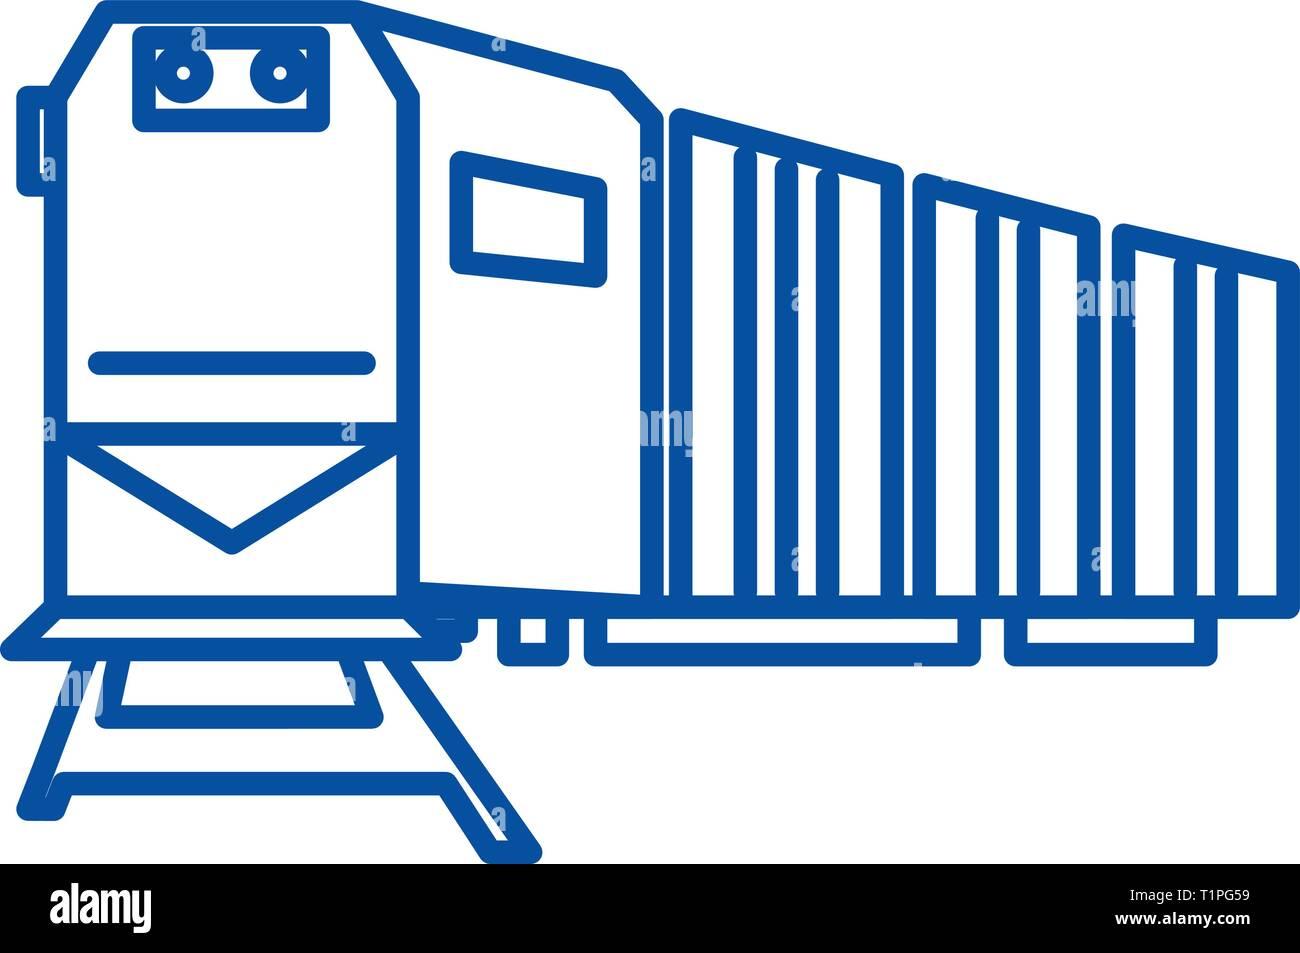 Railway logistics,train,cargo line icon concept. Railway logistics,train,cargo flat  vector symbol, sign, outline illustration. - Stock Vector